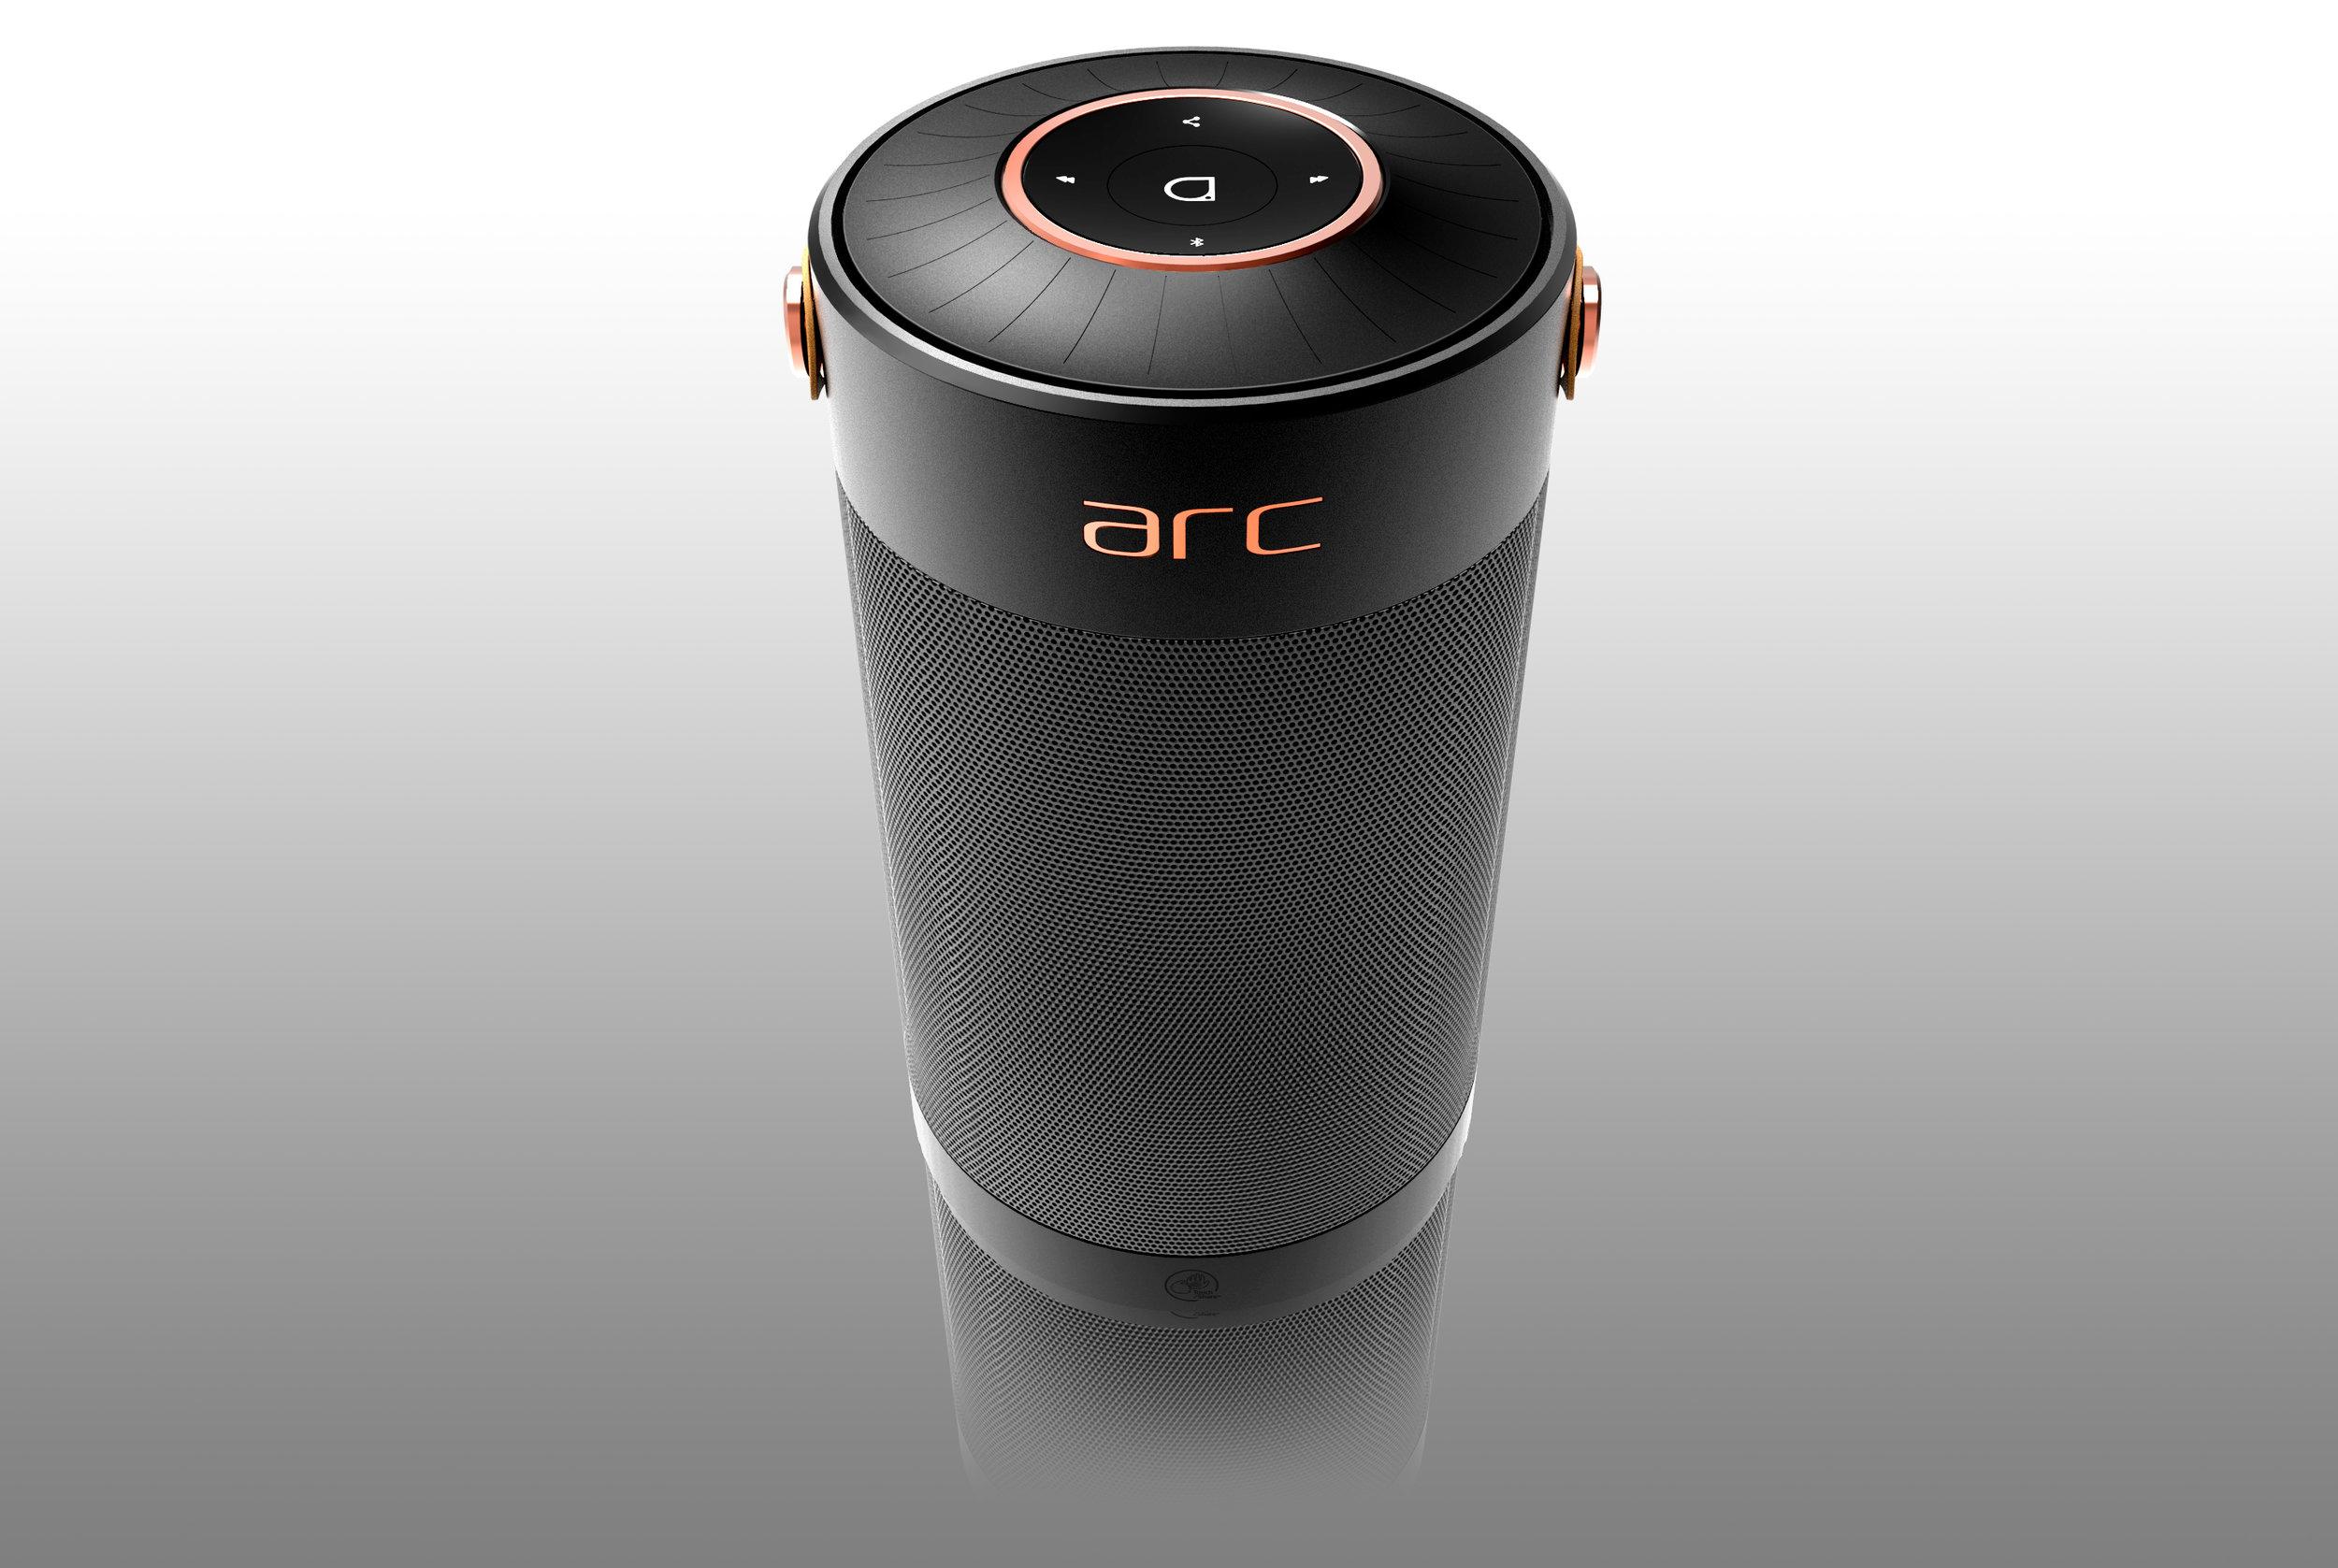 ARC _ wifi speaker cylindre_Hero 03 copy.jpg